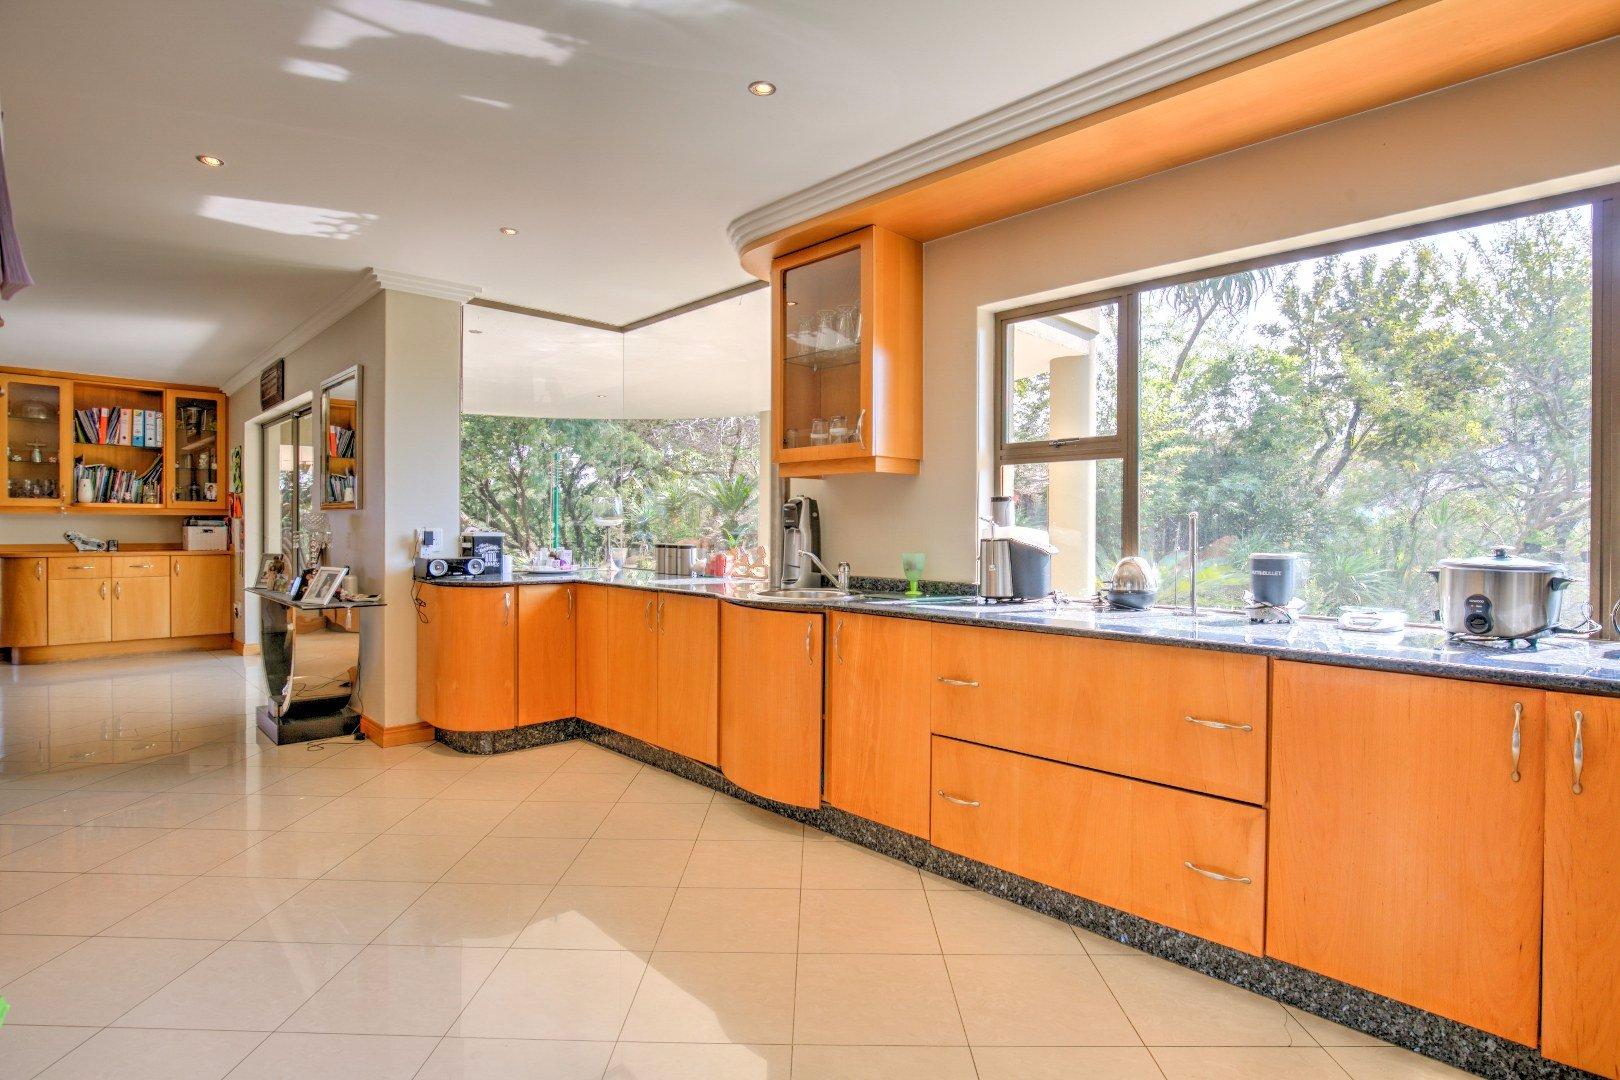 Bassonia property for sale. Ref No: 13525151. Picture no 9